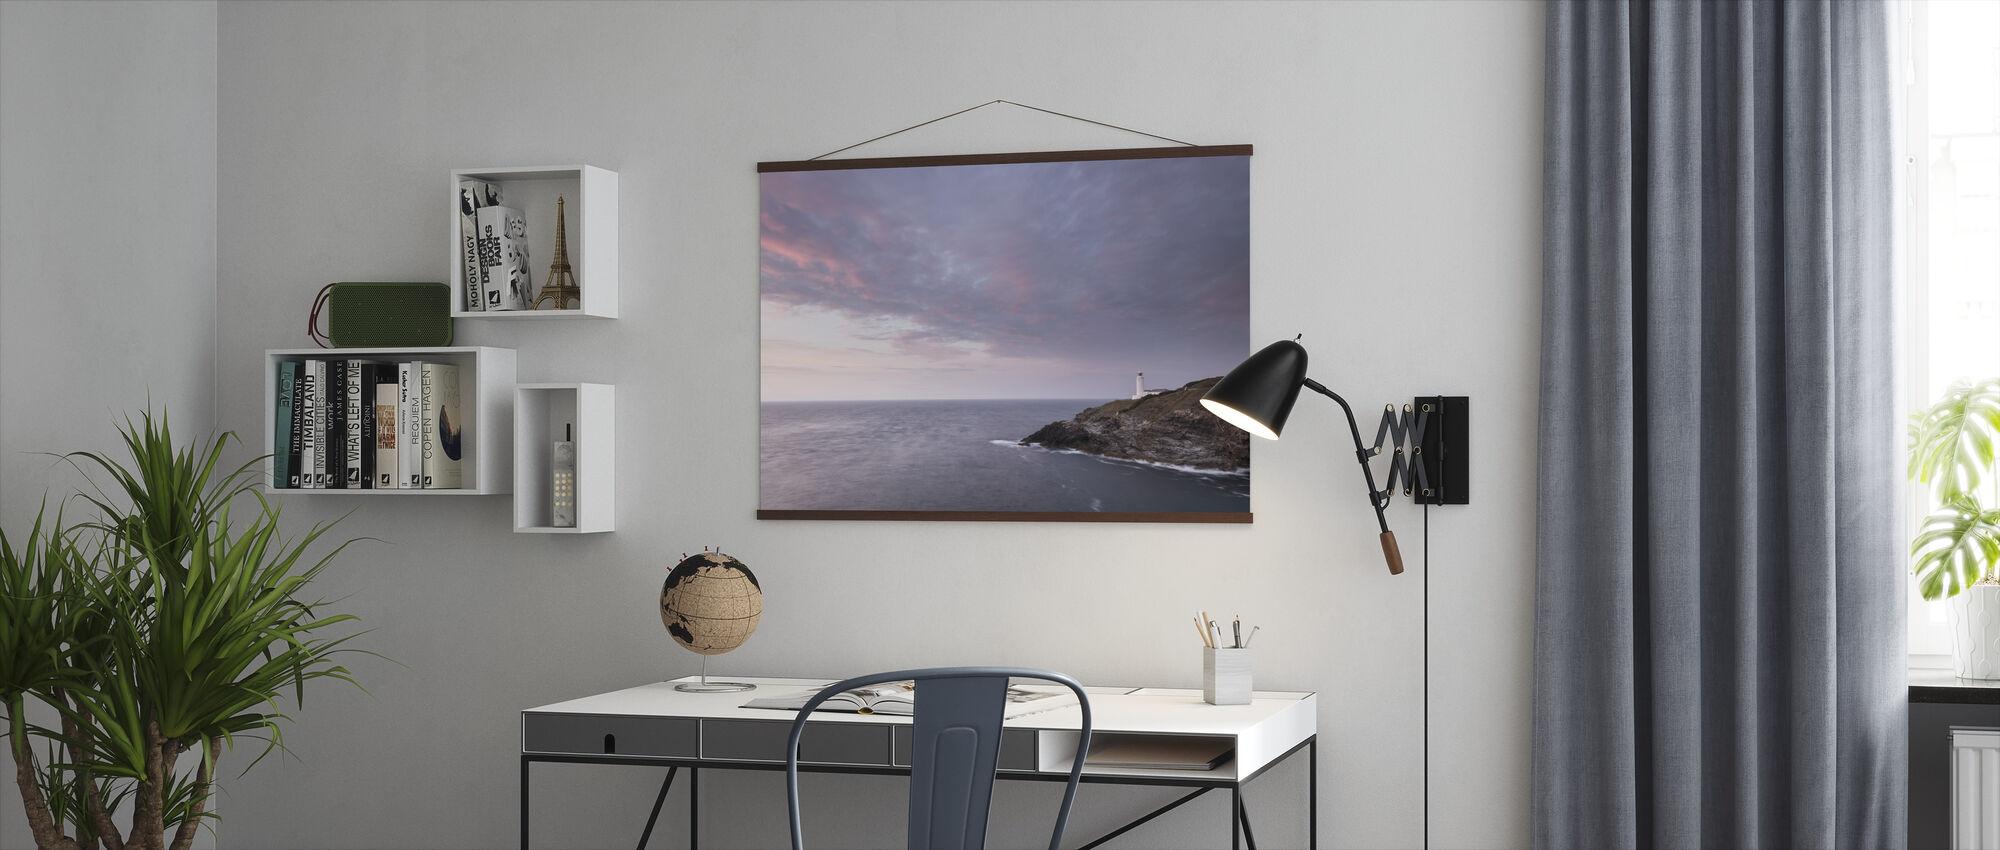 Trevose Lighthouse at Sunset - Poster - Office